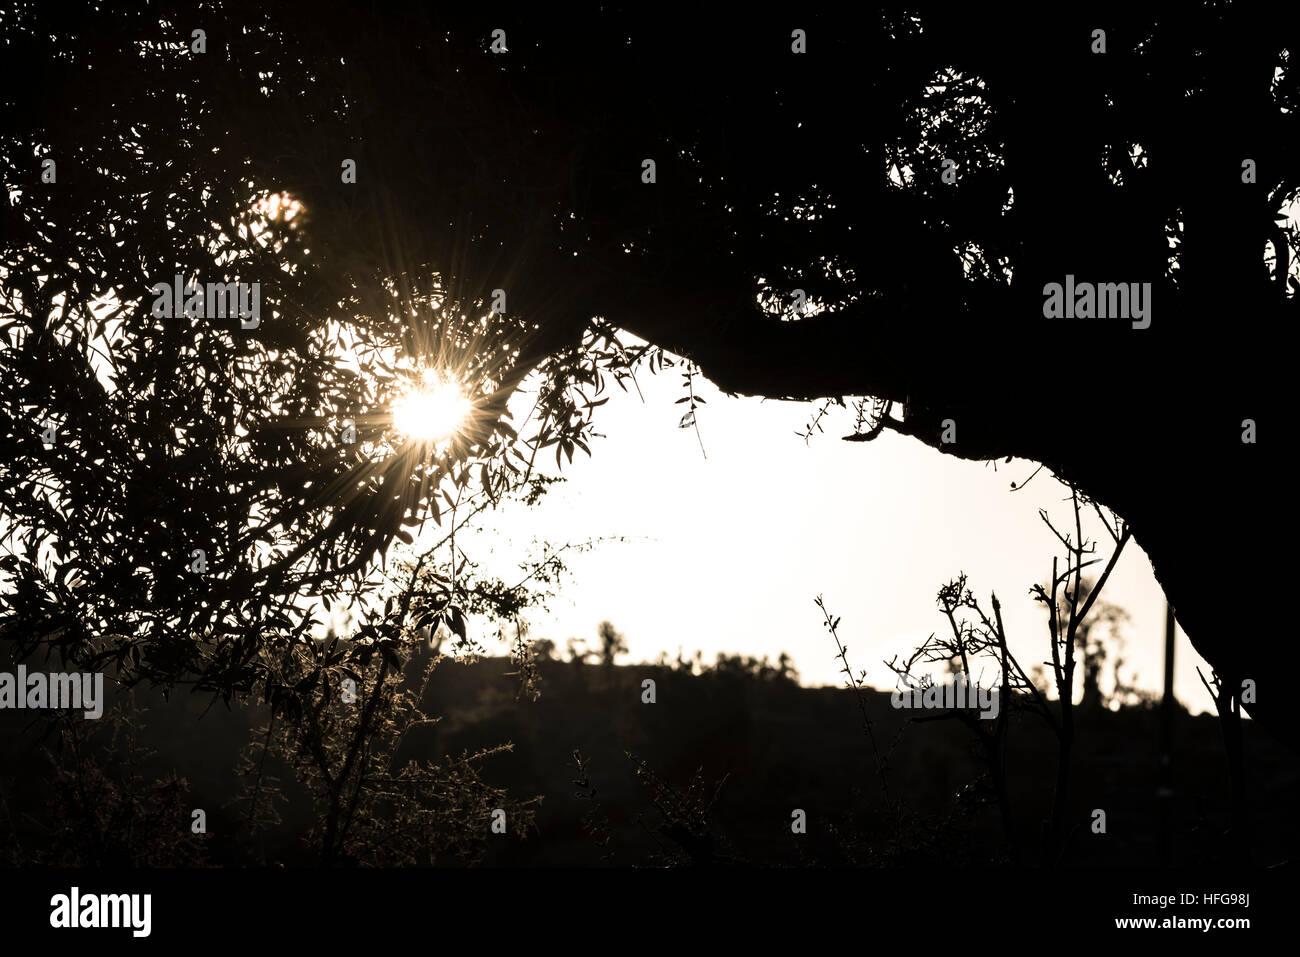 Sunstar through the bushes. Shot from Jabal Shams, Sultanate of Oman - Stock Image